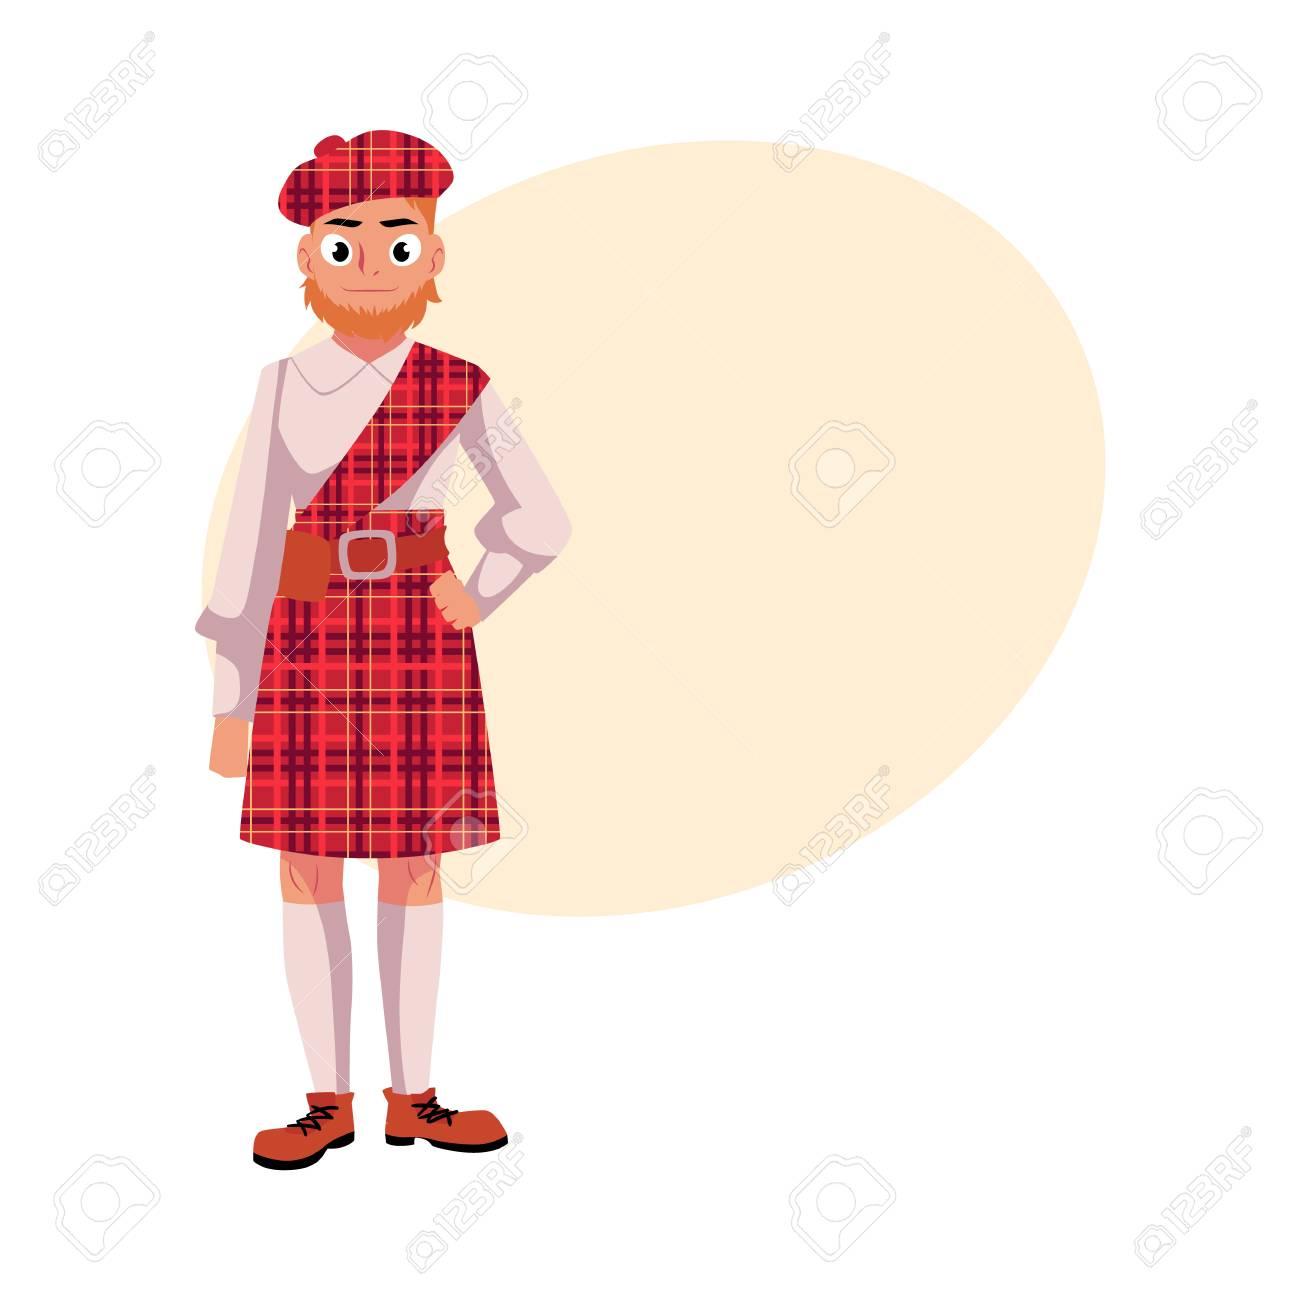 Schottische männer charakter